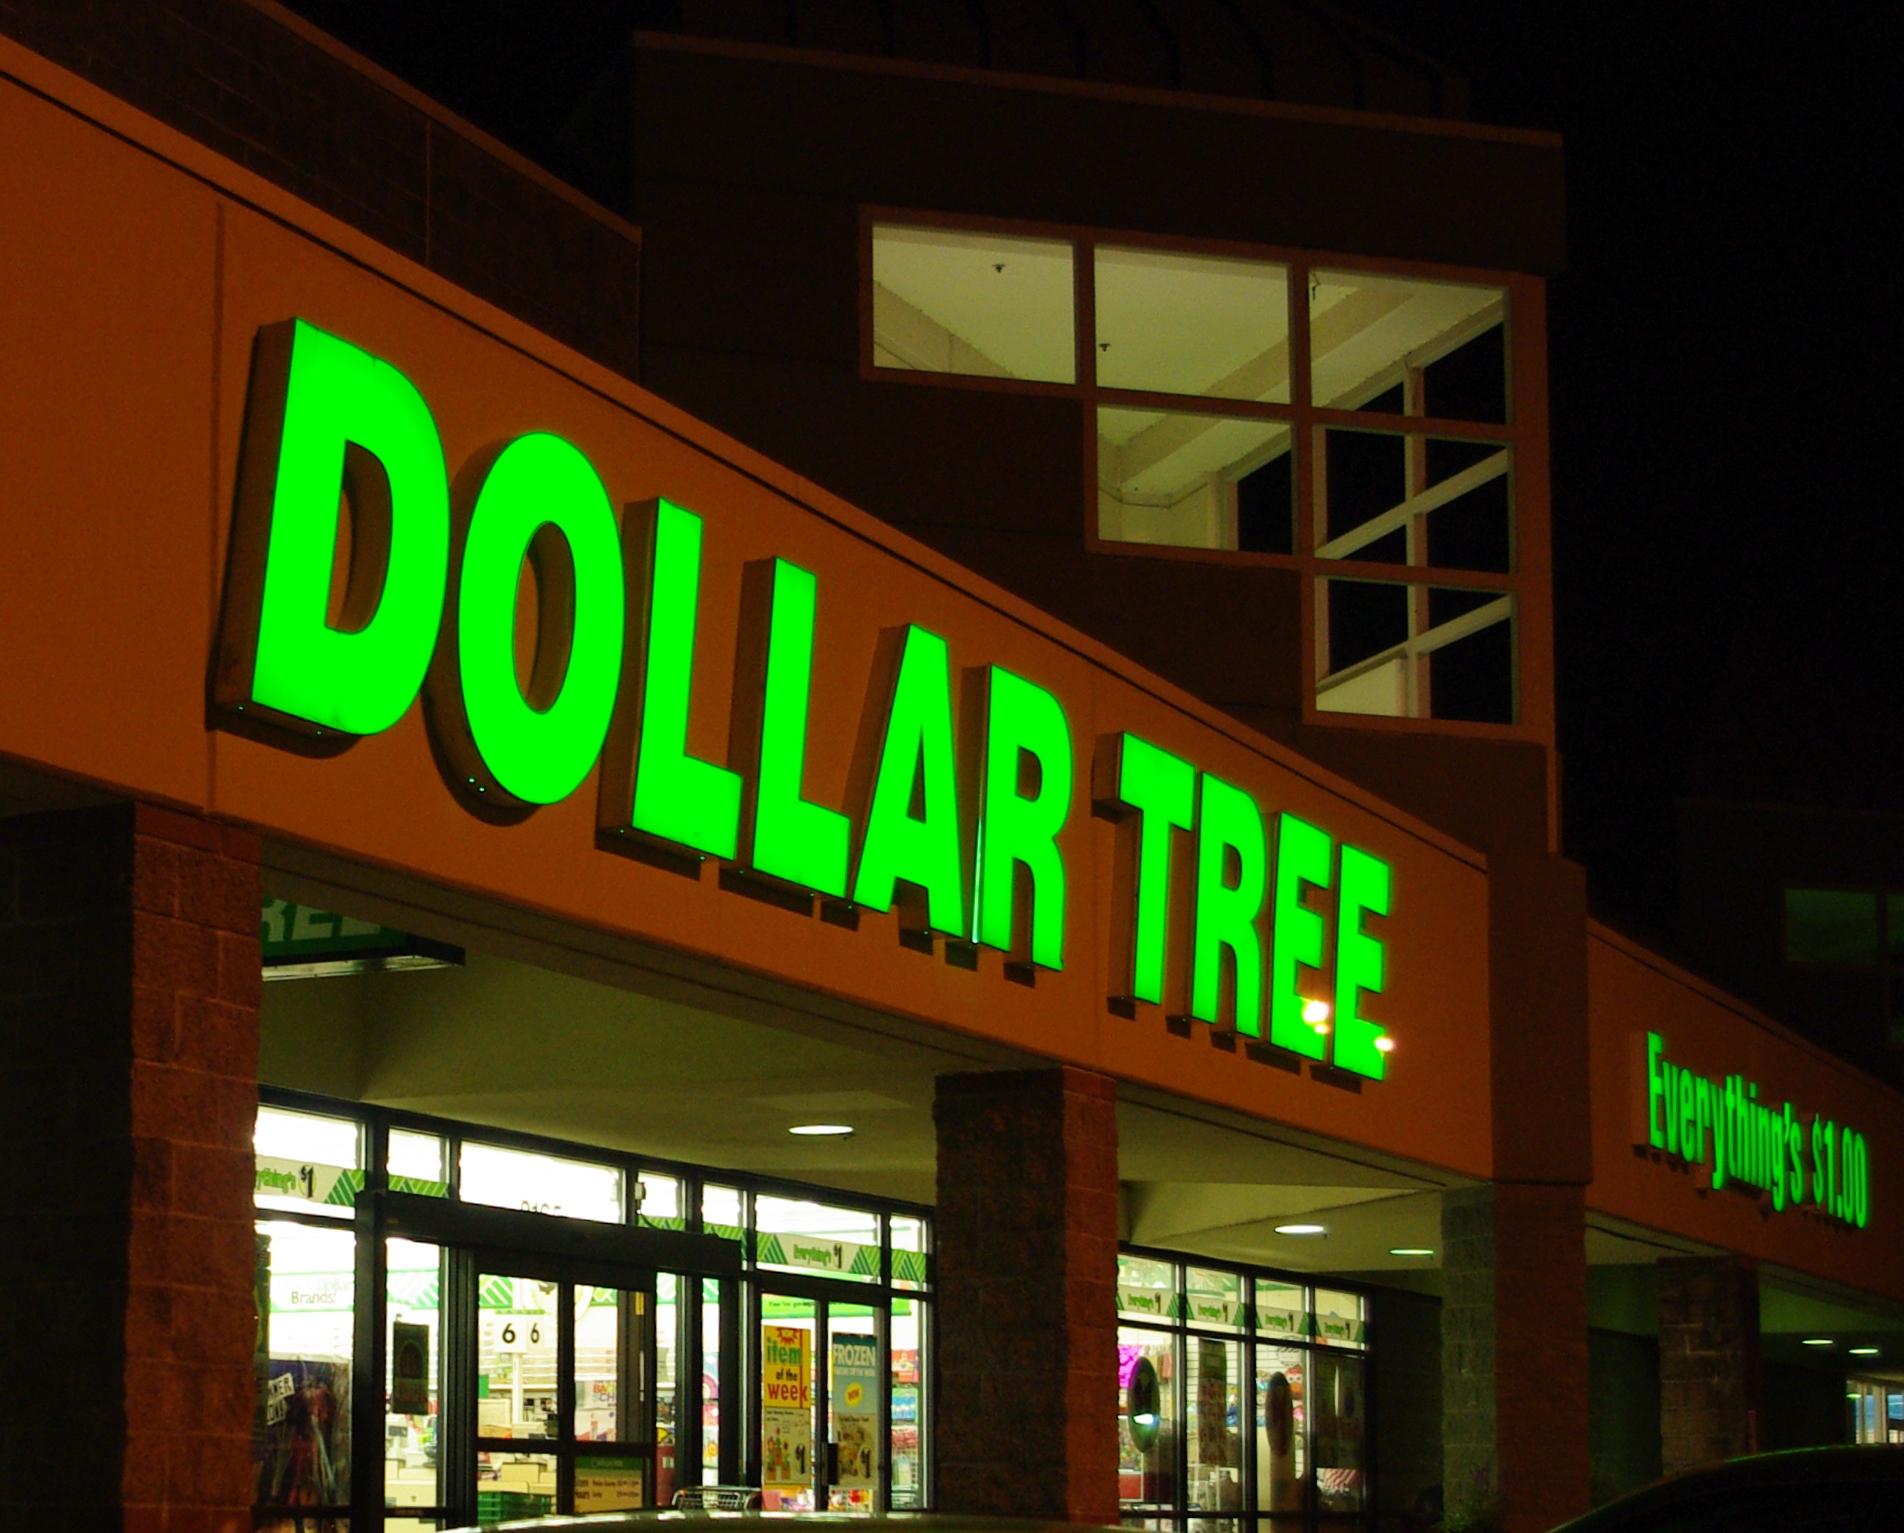 Dollar tree - Image Credit